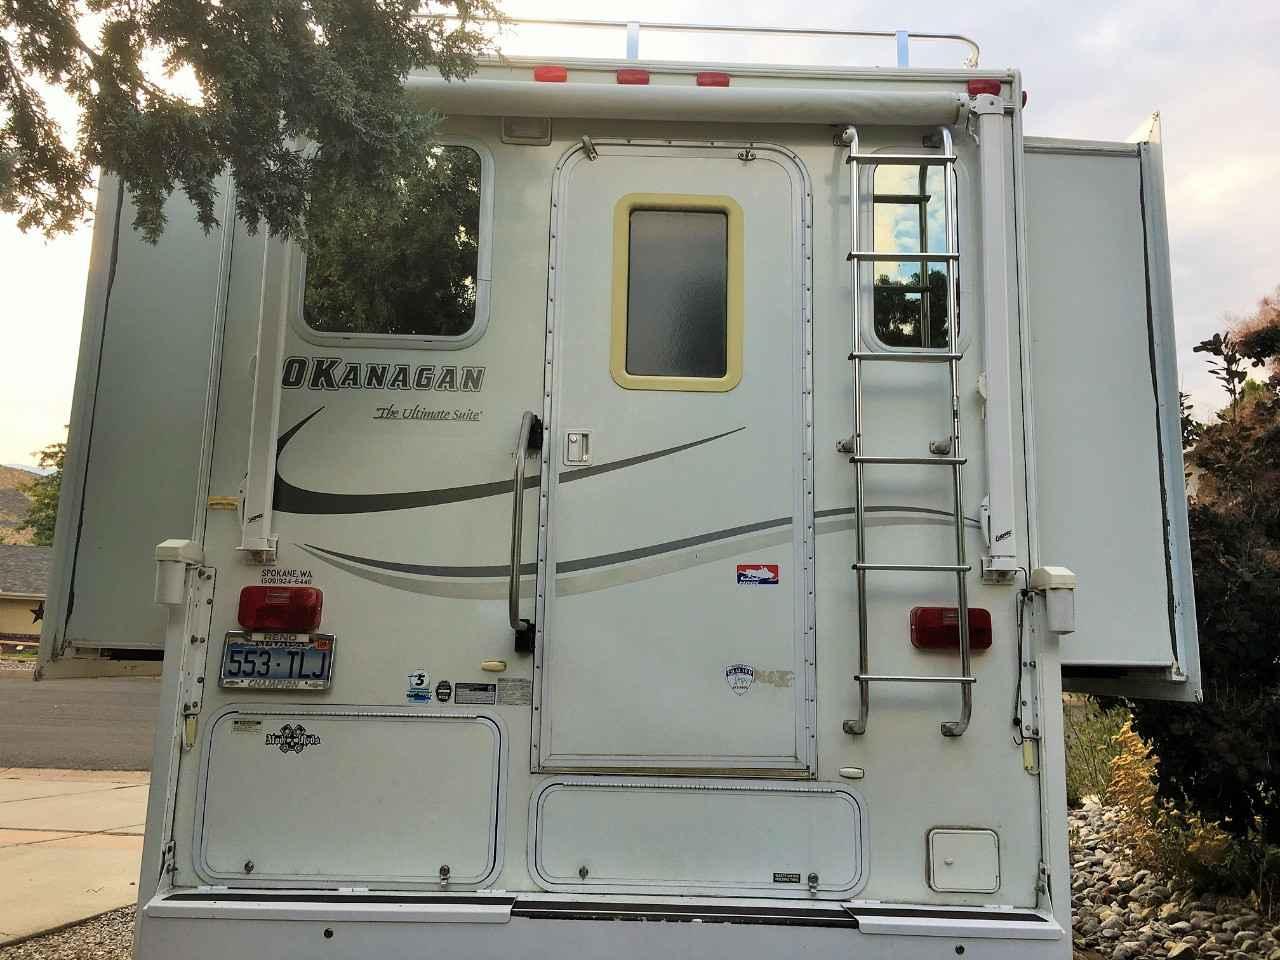 2005 Used Okanagan ULTIMATE SUITE 116ULT Truck Camper in Nevada NV Okanagan Truck Camper Wiring Diagrams on